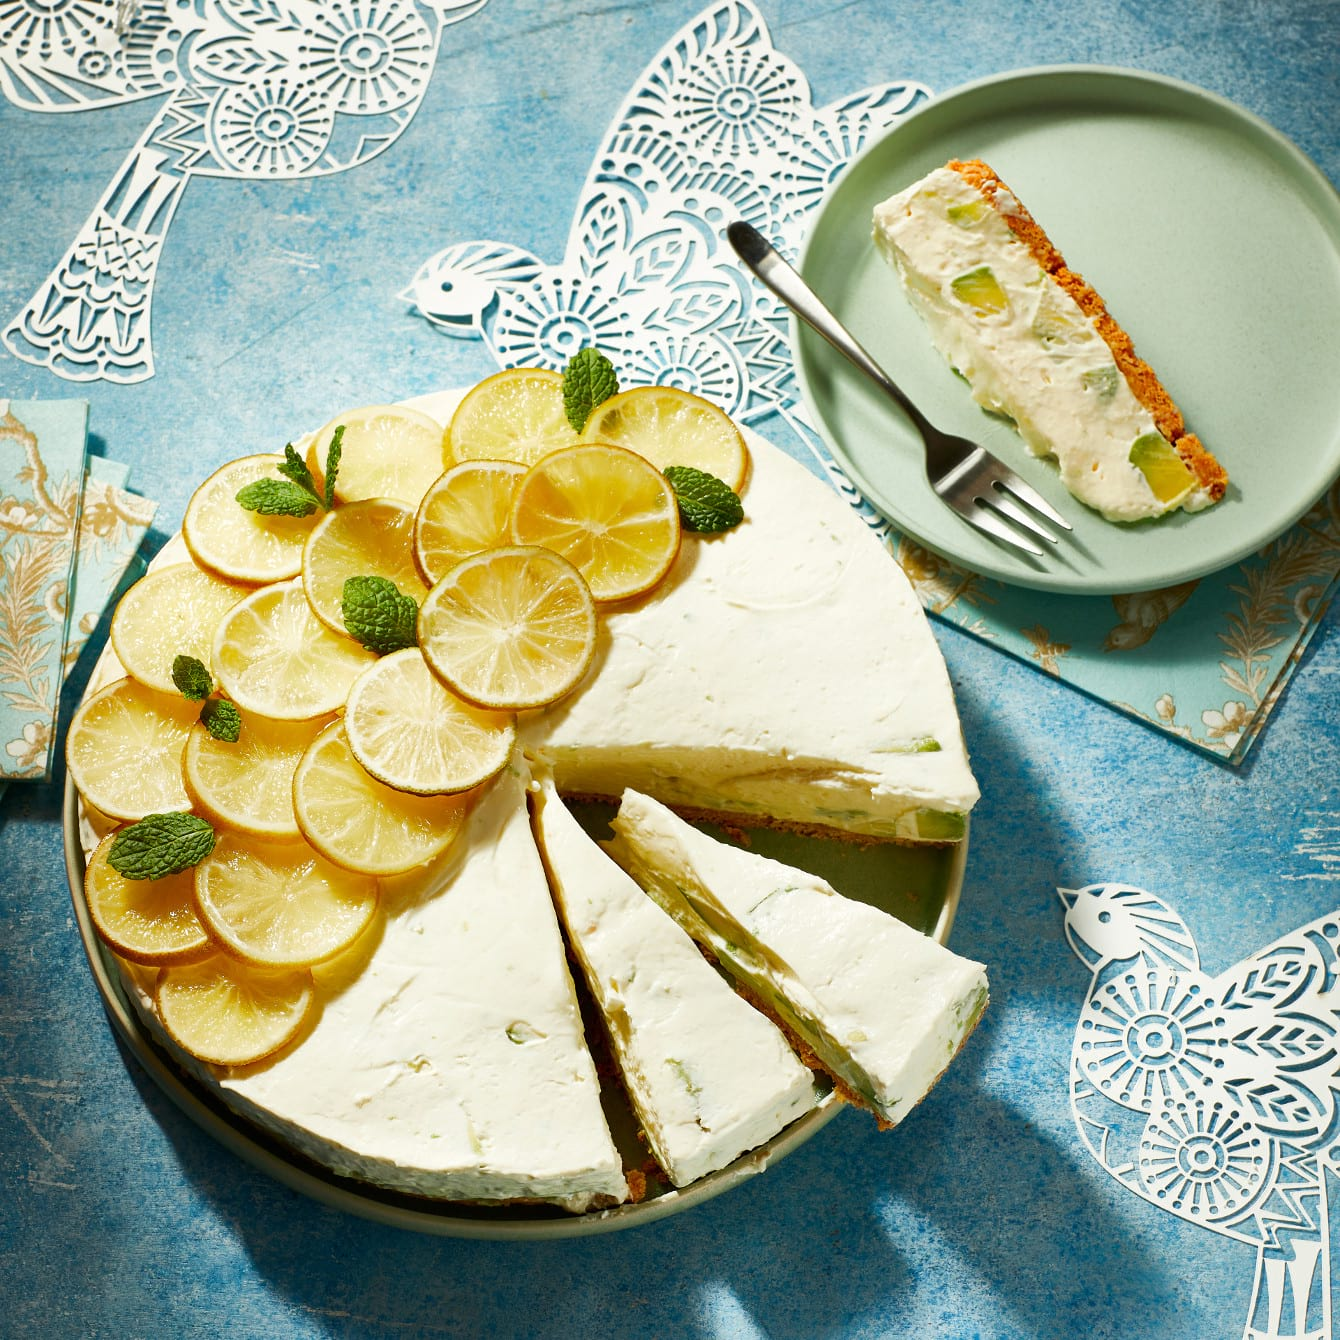 Avocado-cheesecake met cantuccini